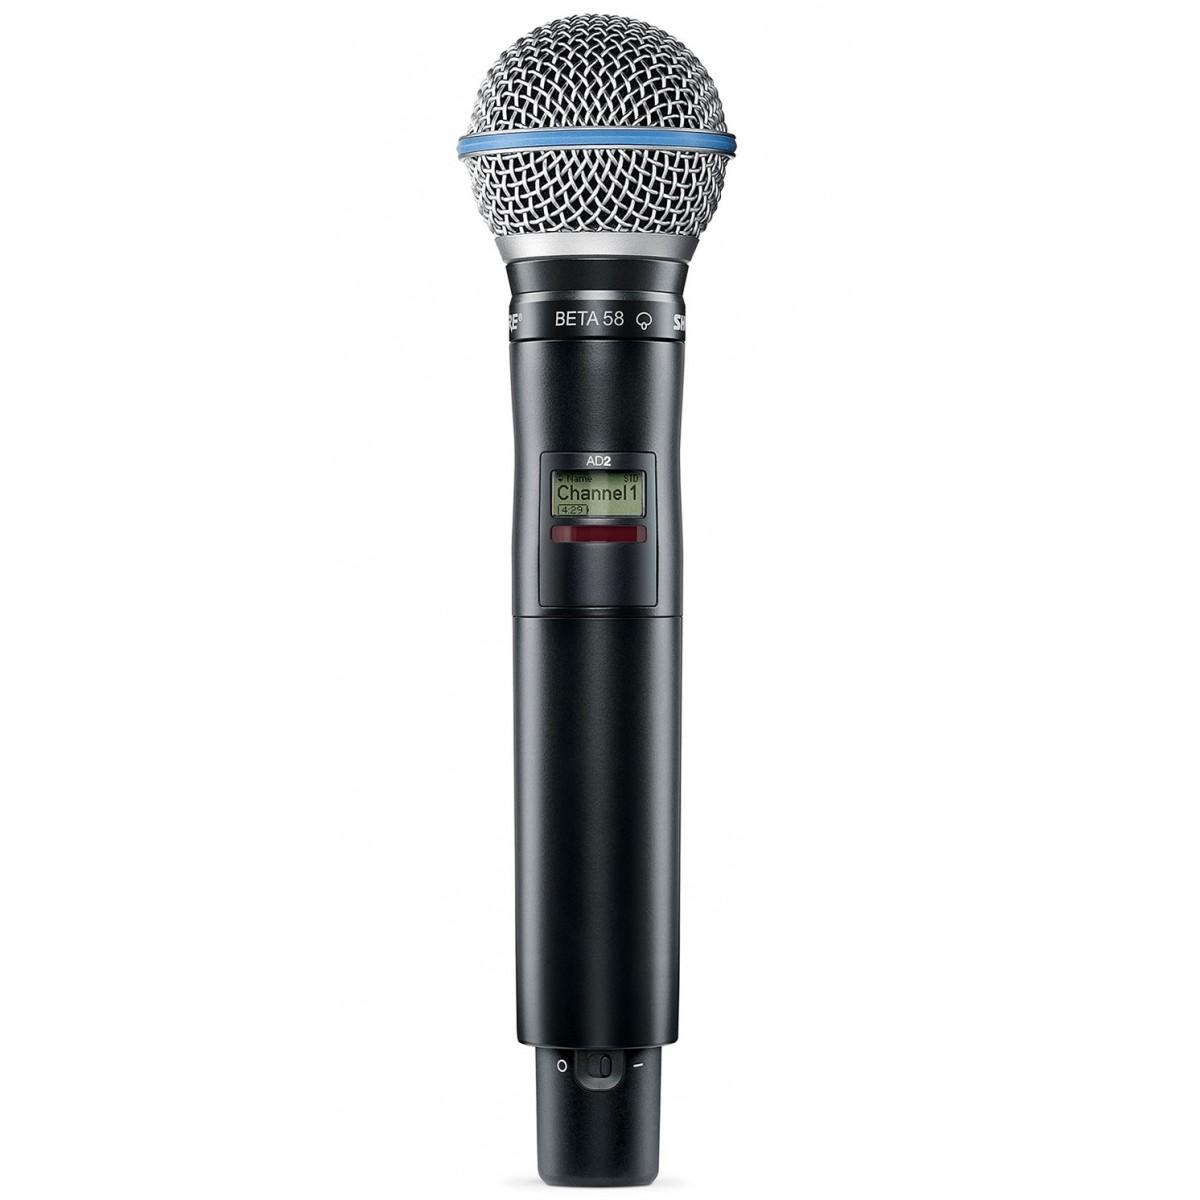 Axient Digital Shure Transmissor de microfone sem fio - AD2/B58